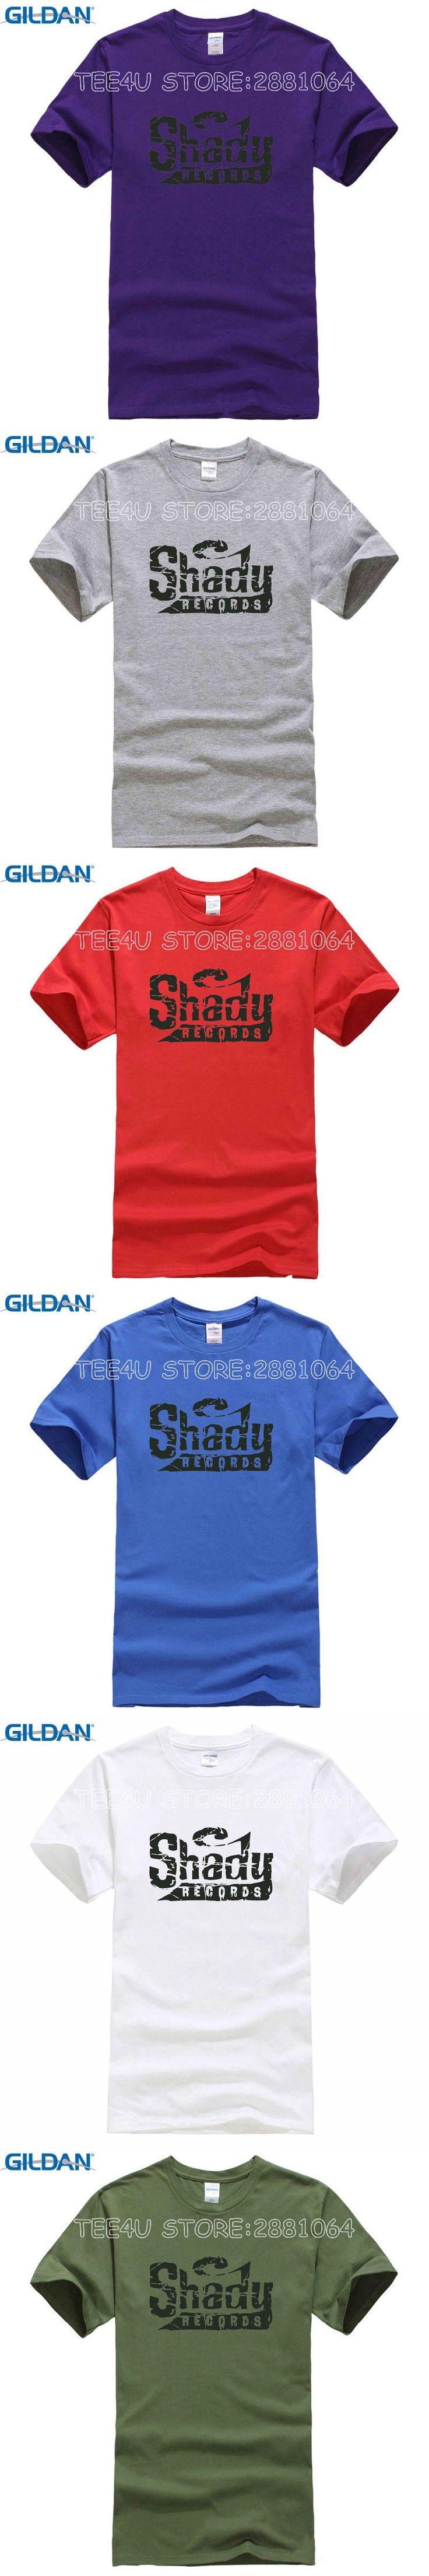 Tee4U T Shirt Tops Summer Crew Neck Men Casual Short Eminem The Real Slim Shady Tee Shirts